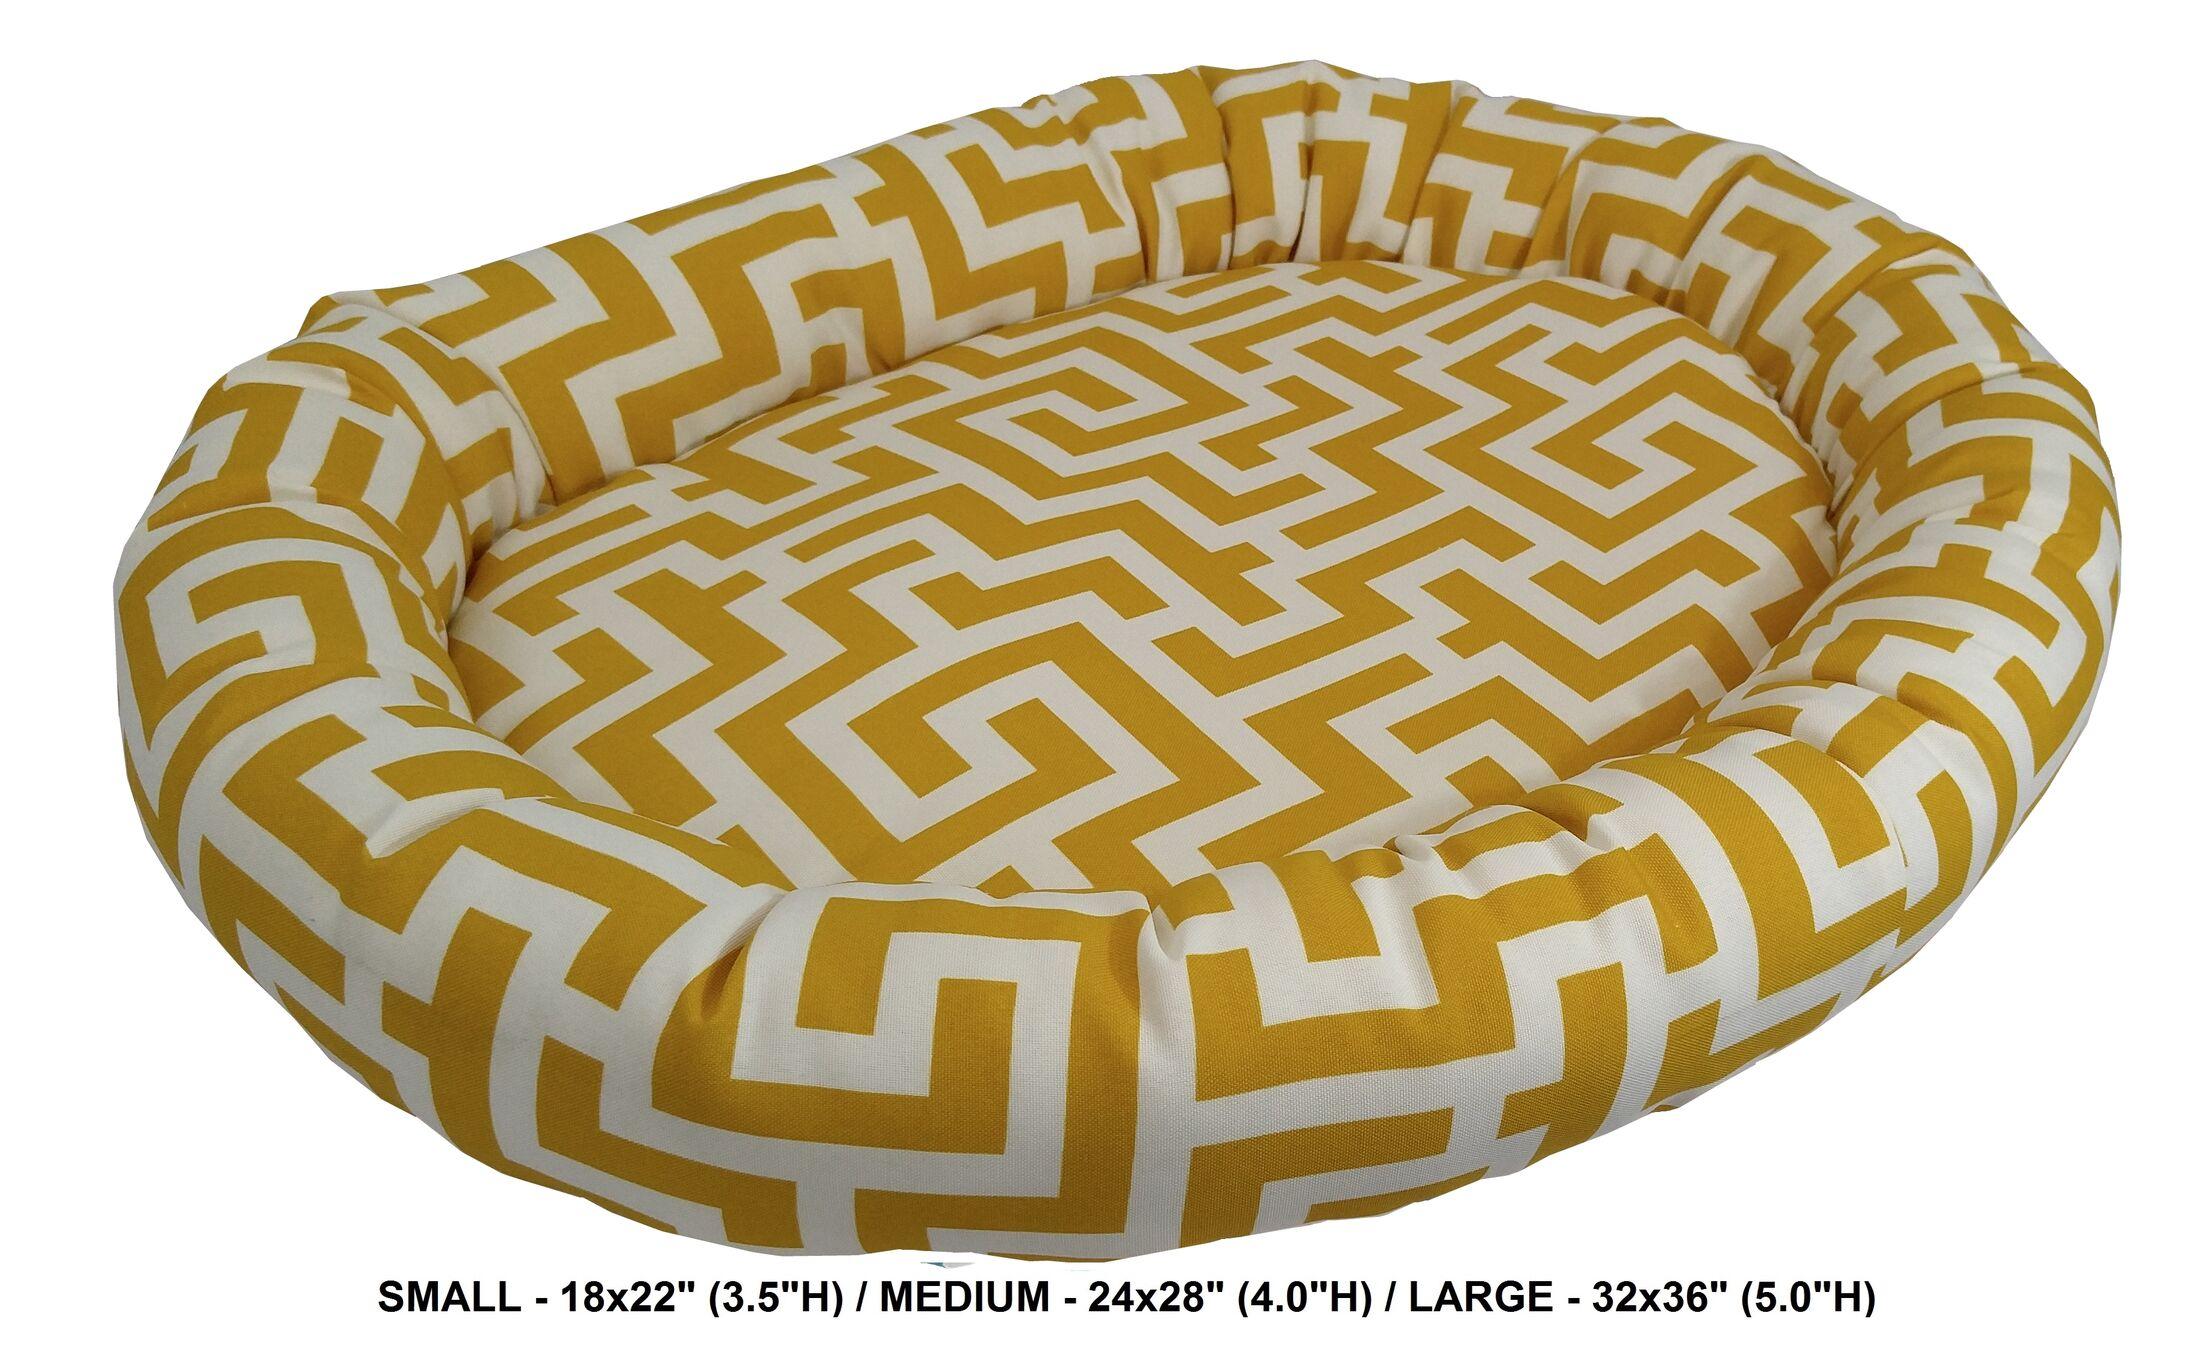 Corrine Keys Indoor/Outdoor Bolster Pet Bed Color: Banana, Size: Large